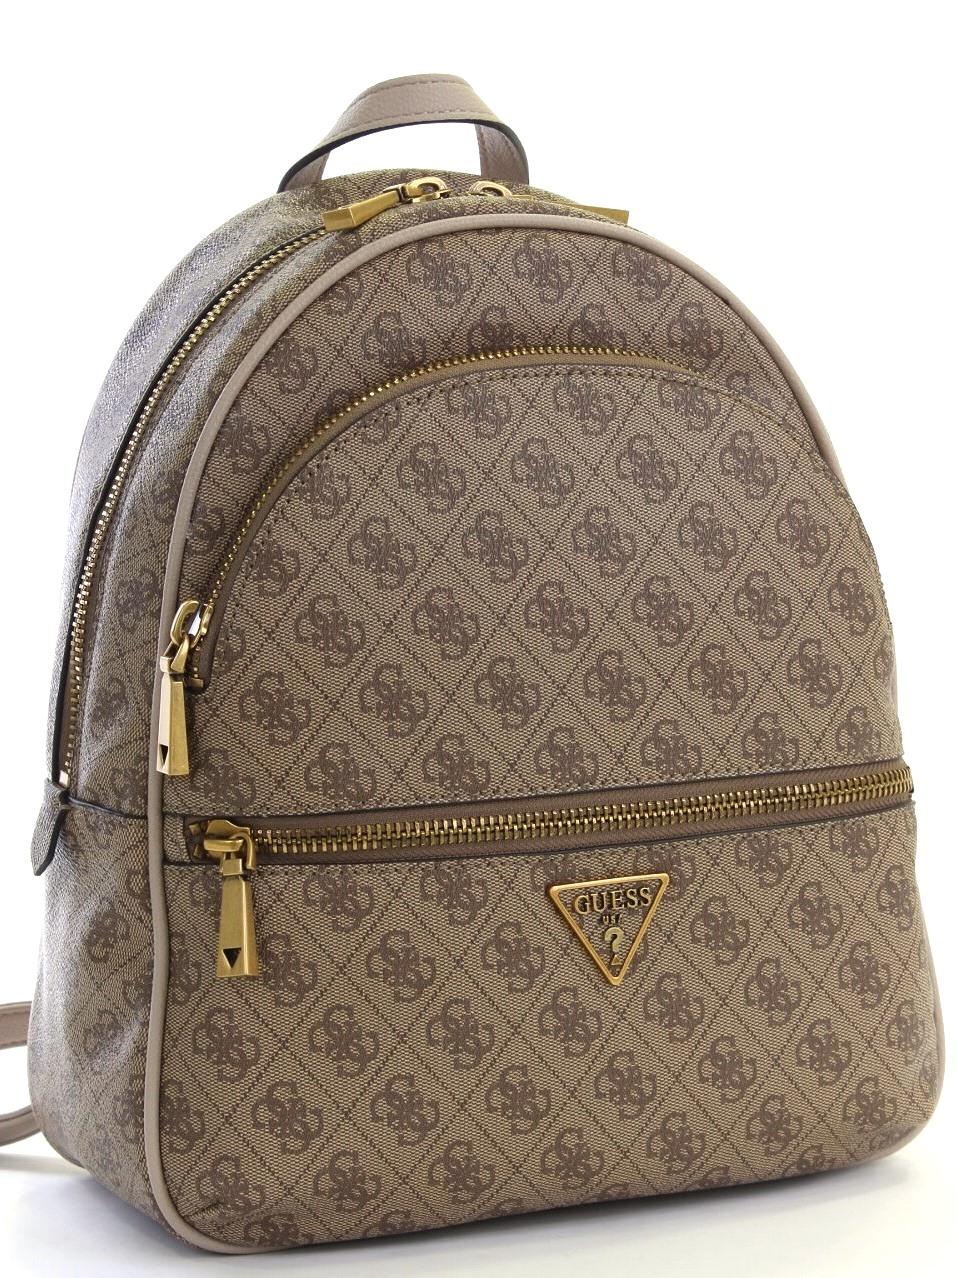 Backpack Guess - 465 HWSB69 94330